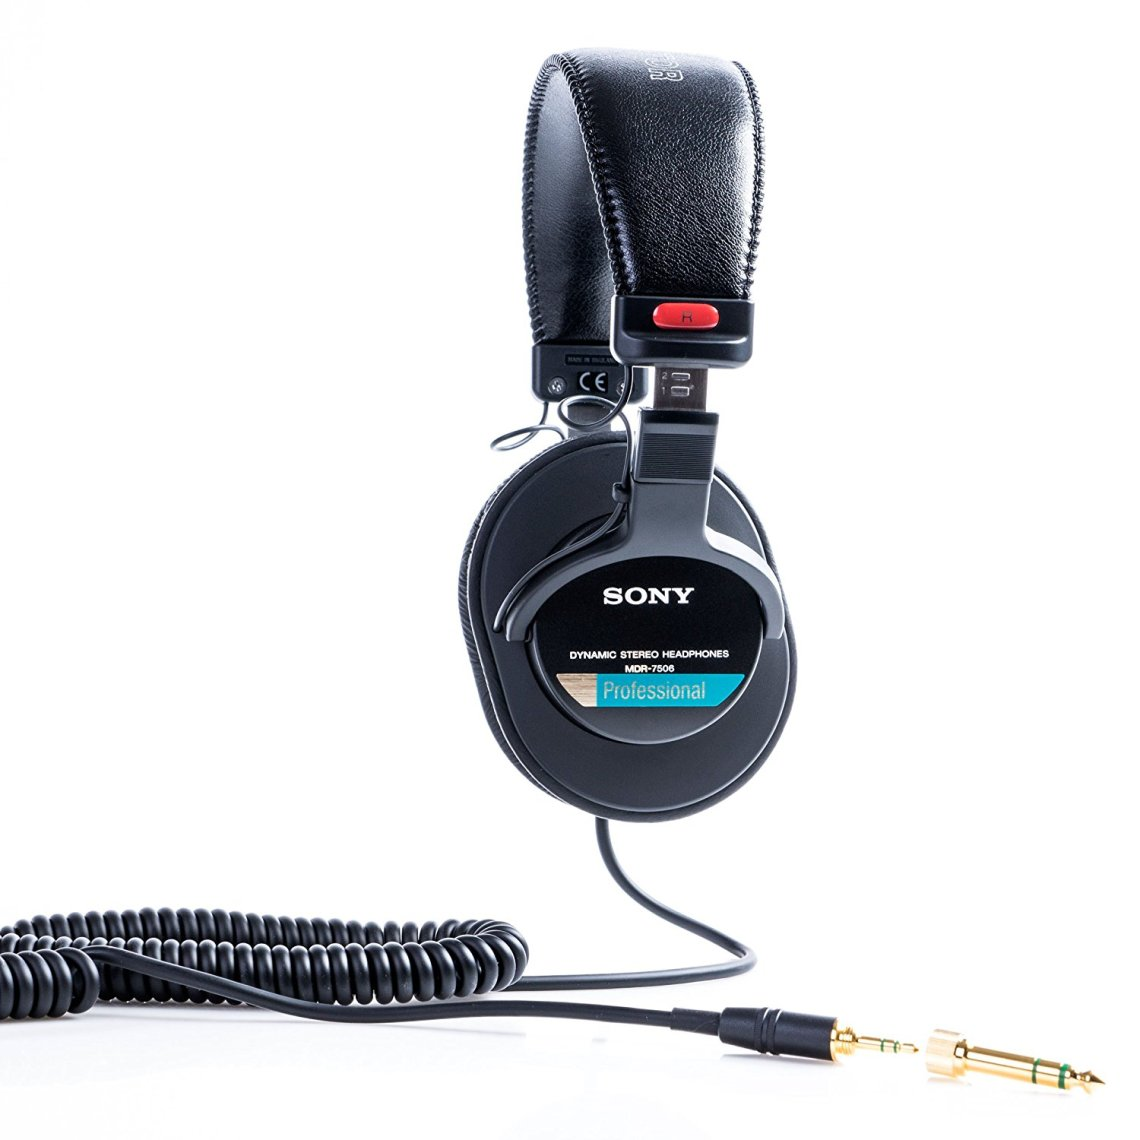 Sony MDR-7560